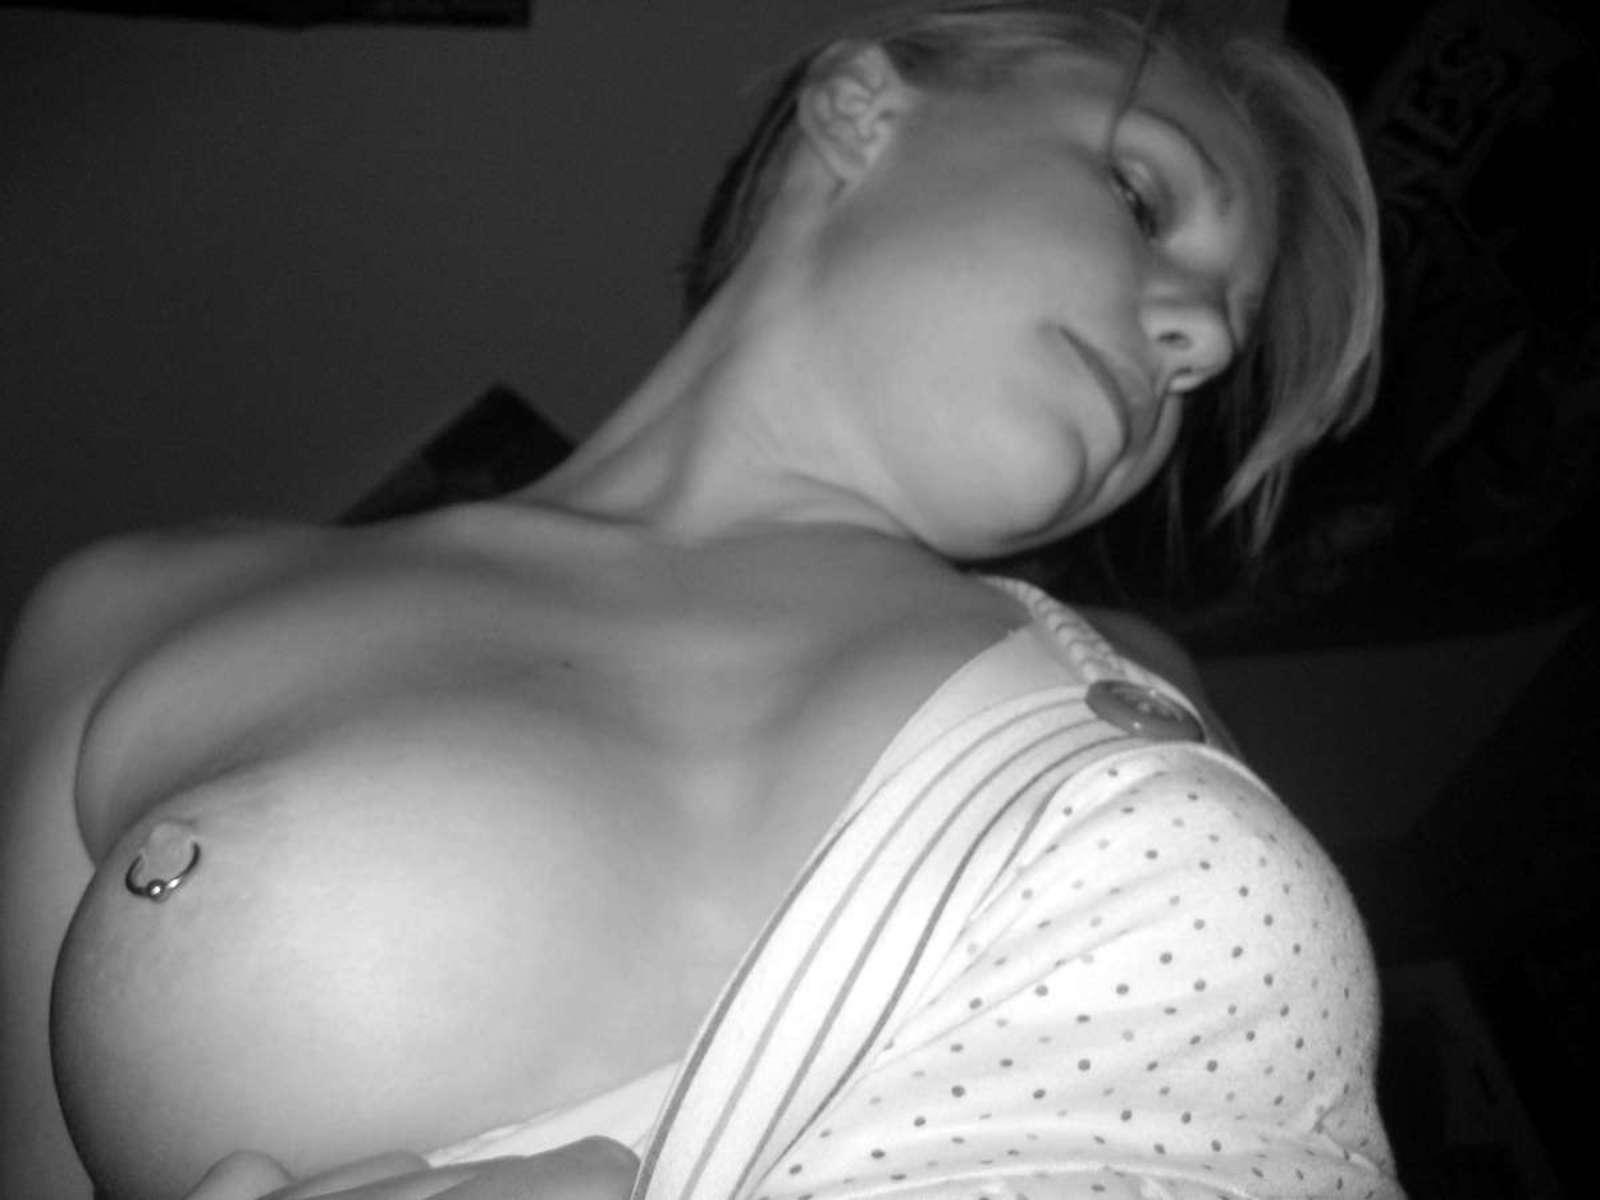 jeune fille sexy n&b (11)